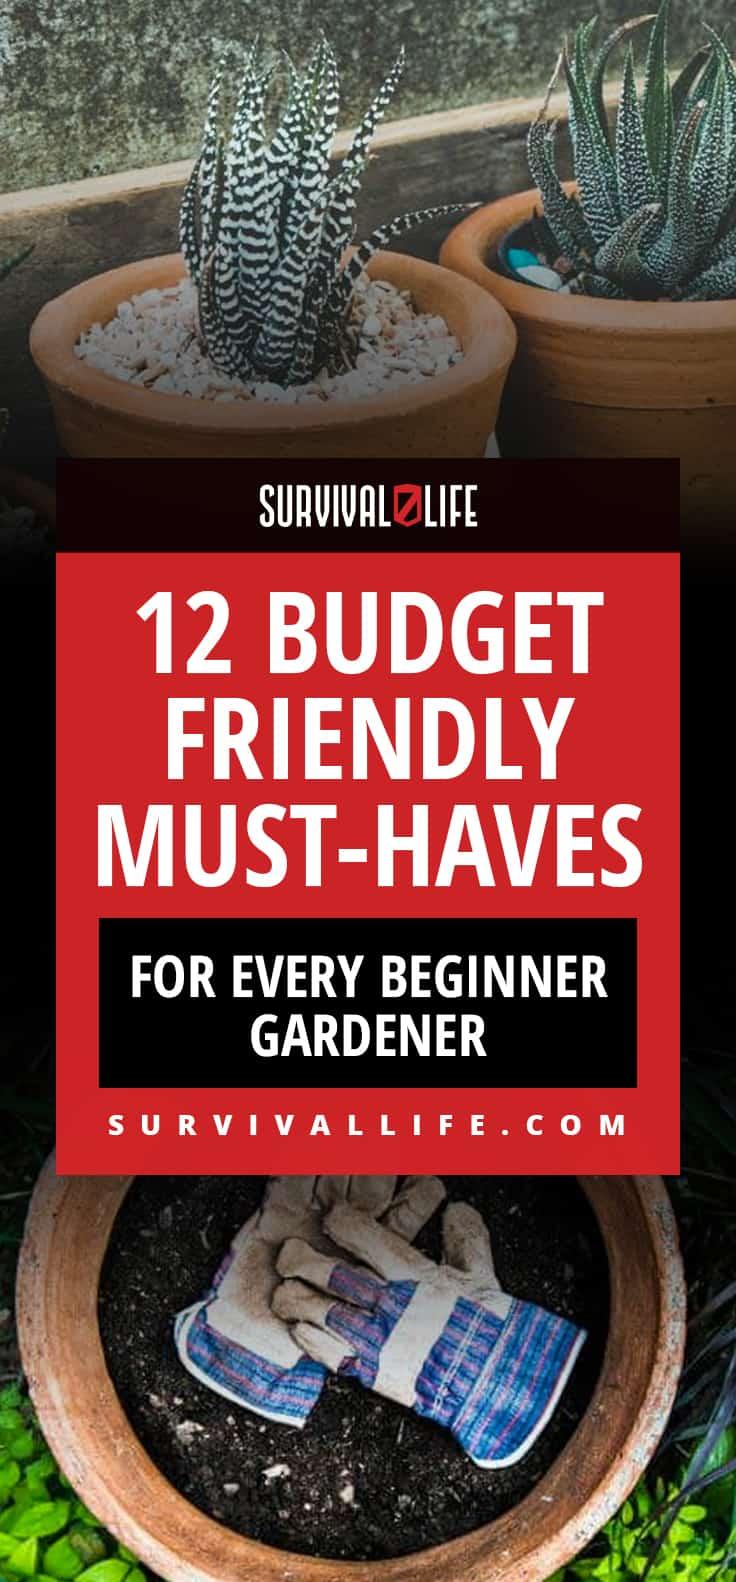 12 Budget Friendly Must-Haves For Every Beginner Gardener